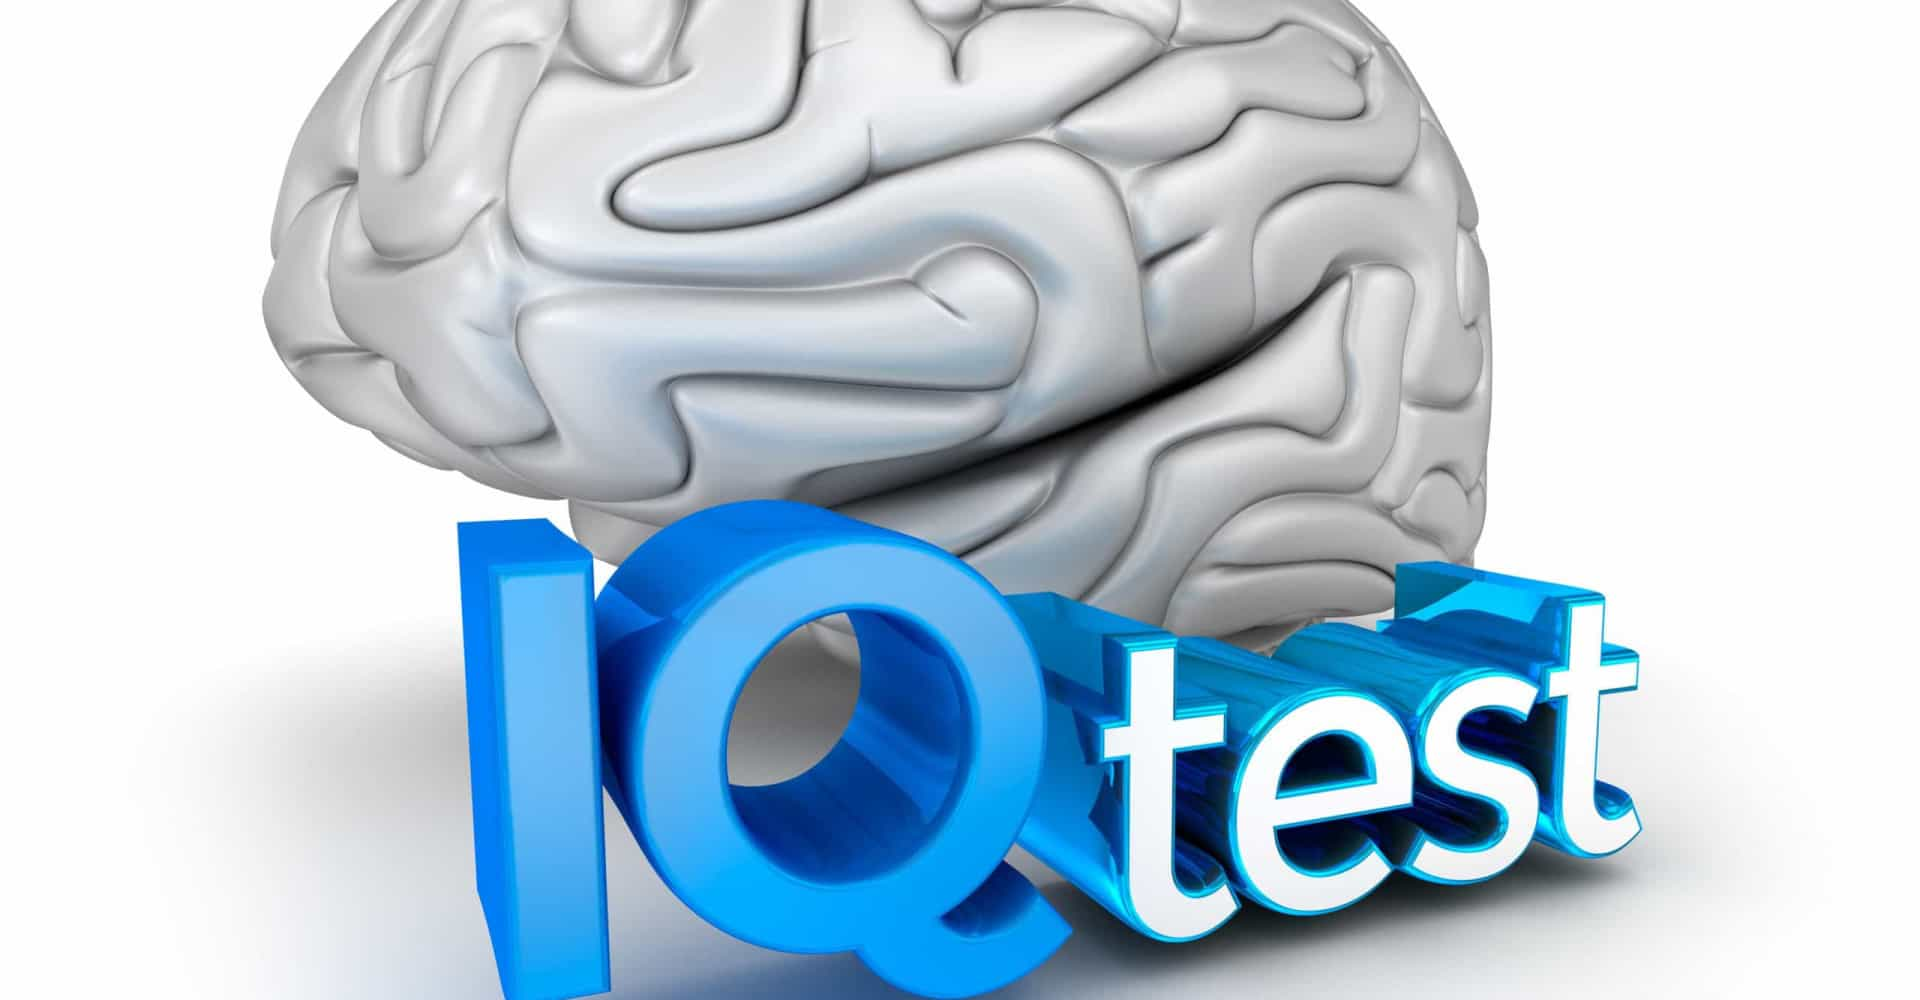 De hoogst en laagst scorende BN'ers bij de Nationale IQ Test